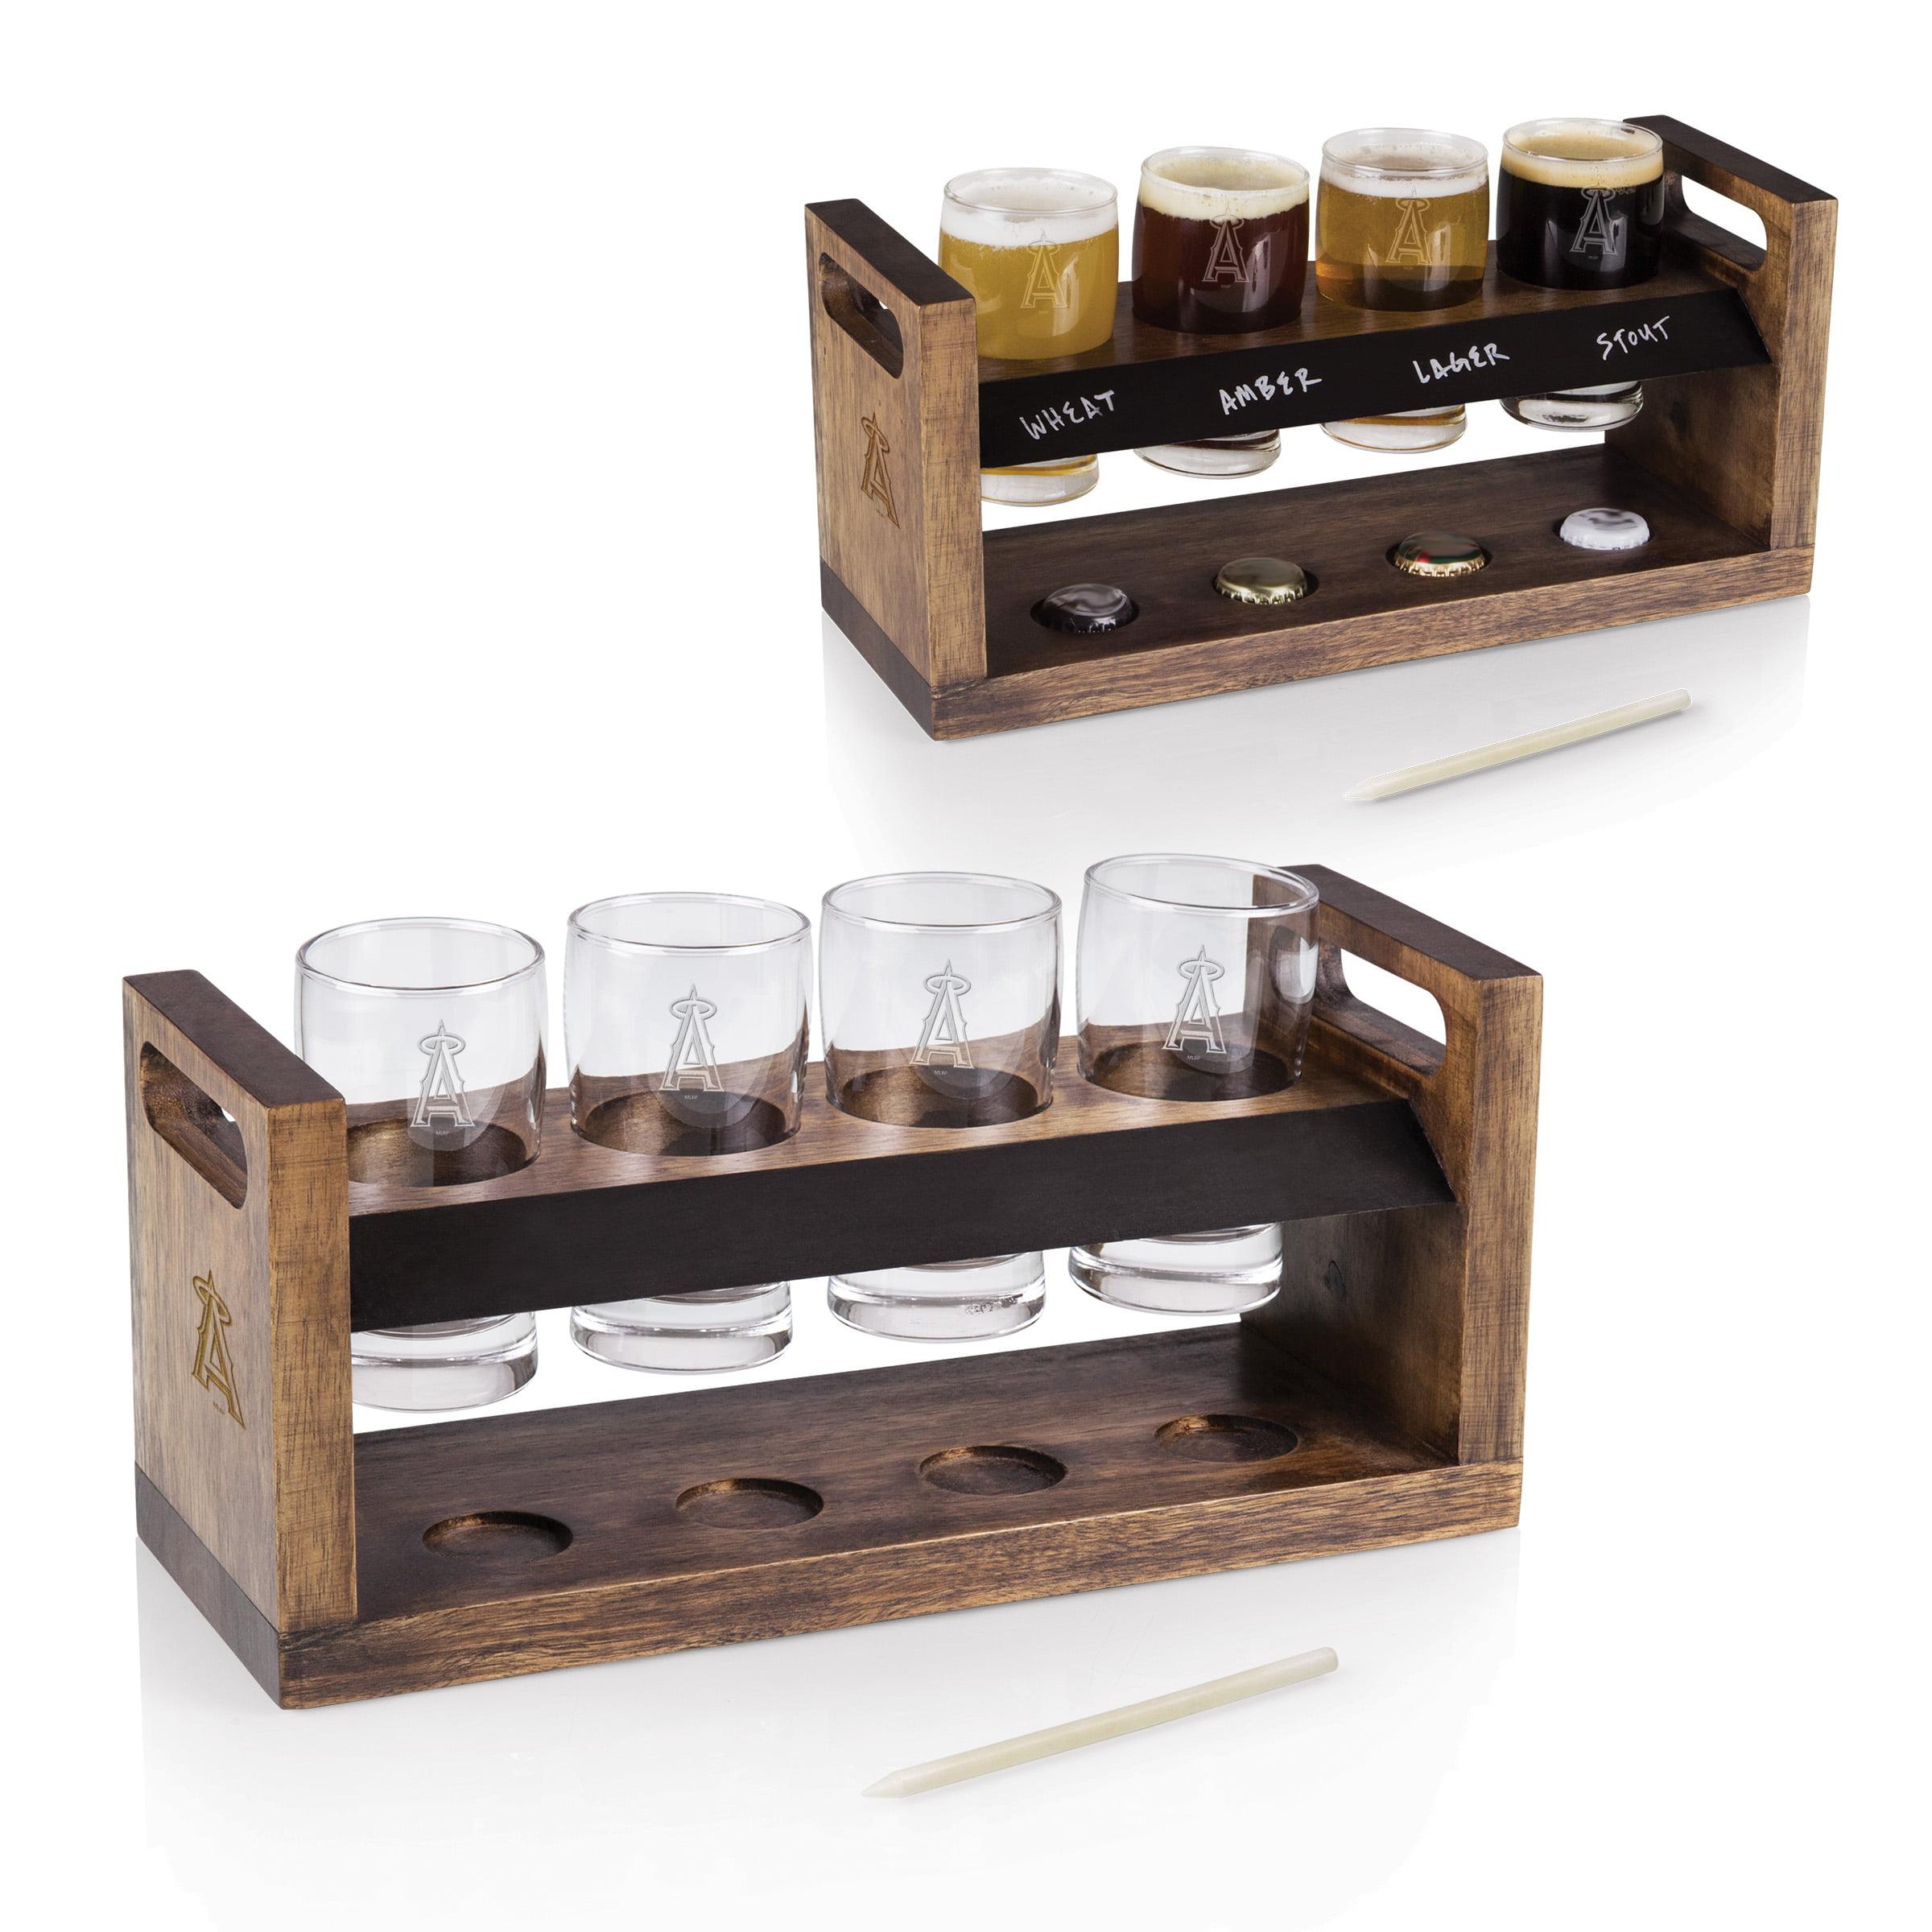 Los Angeles Angels Craft Beer Flight - Brown - No Size